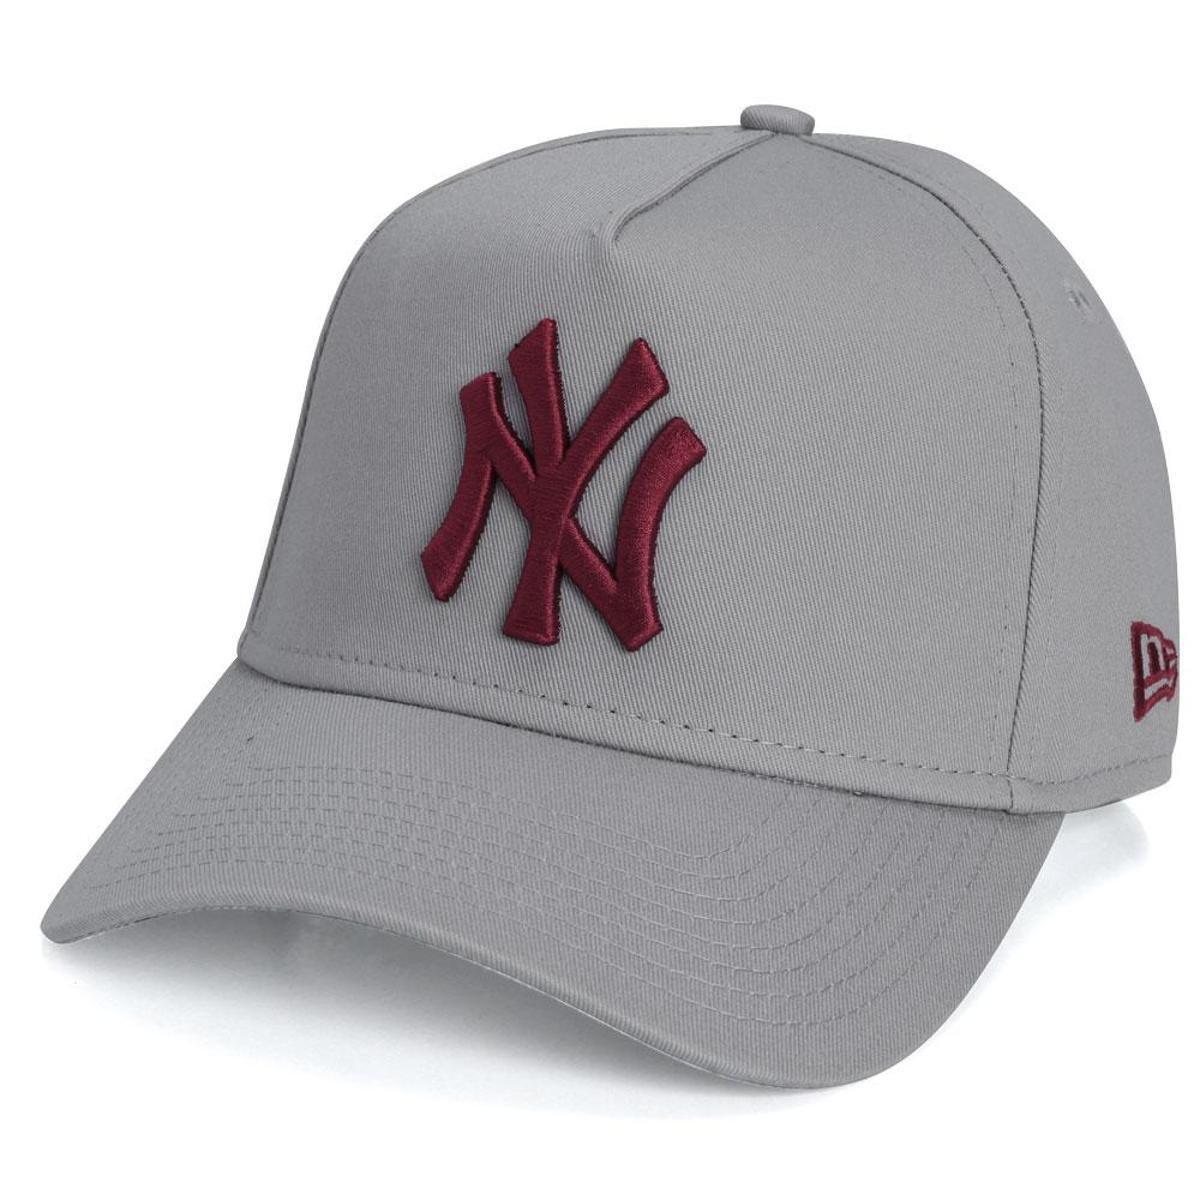 2f1ca08b22ce5 Bone 940 New York Yankees MLB New Era - Cinza - Compre Agora